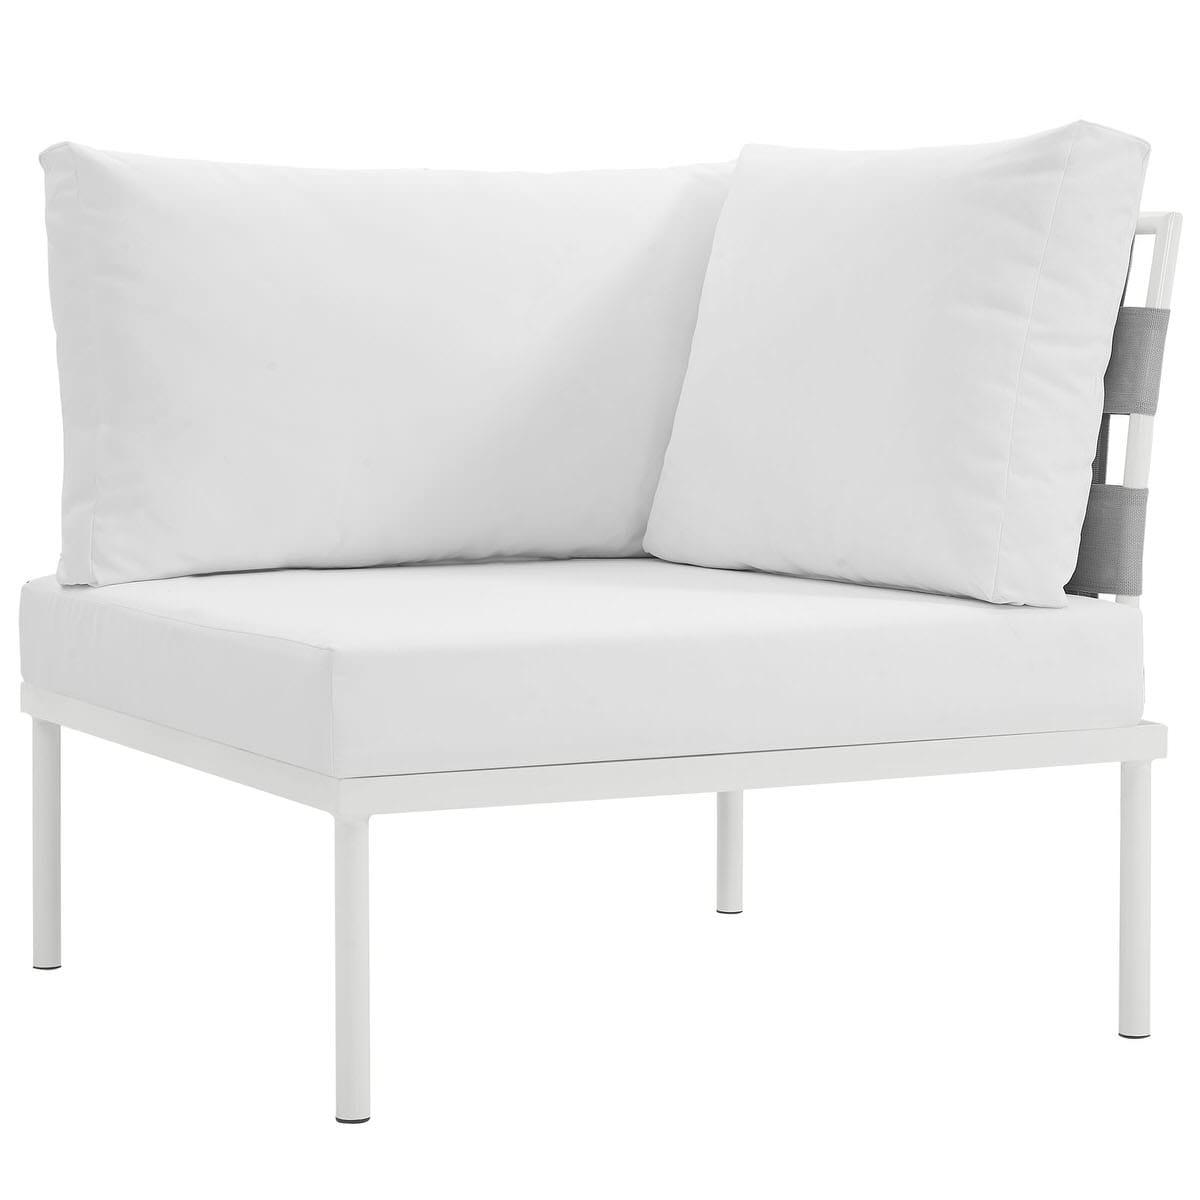 Harmony Outdoor Patio Aluminum Corner Sofa White White by Modern Living